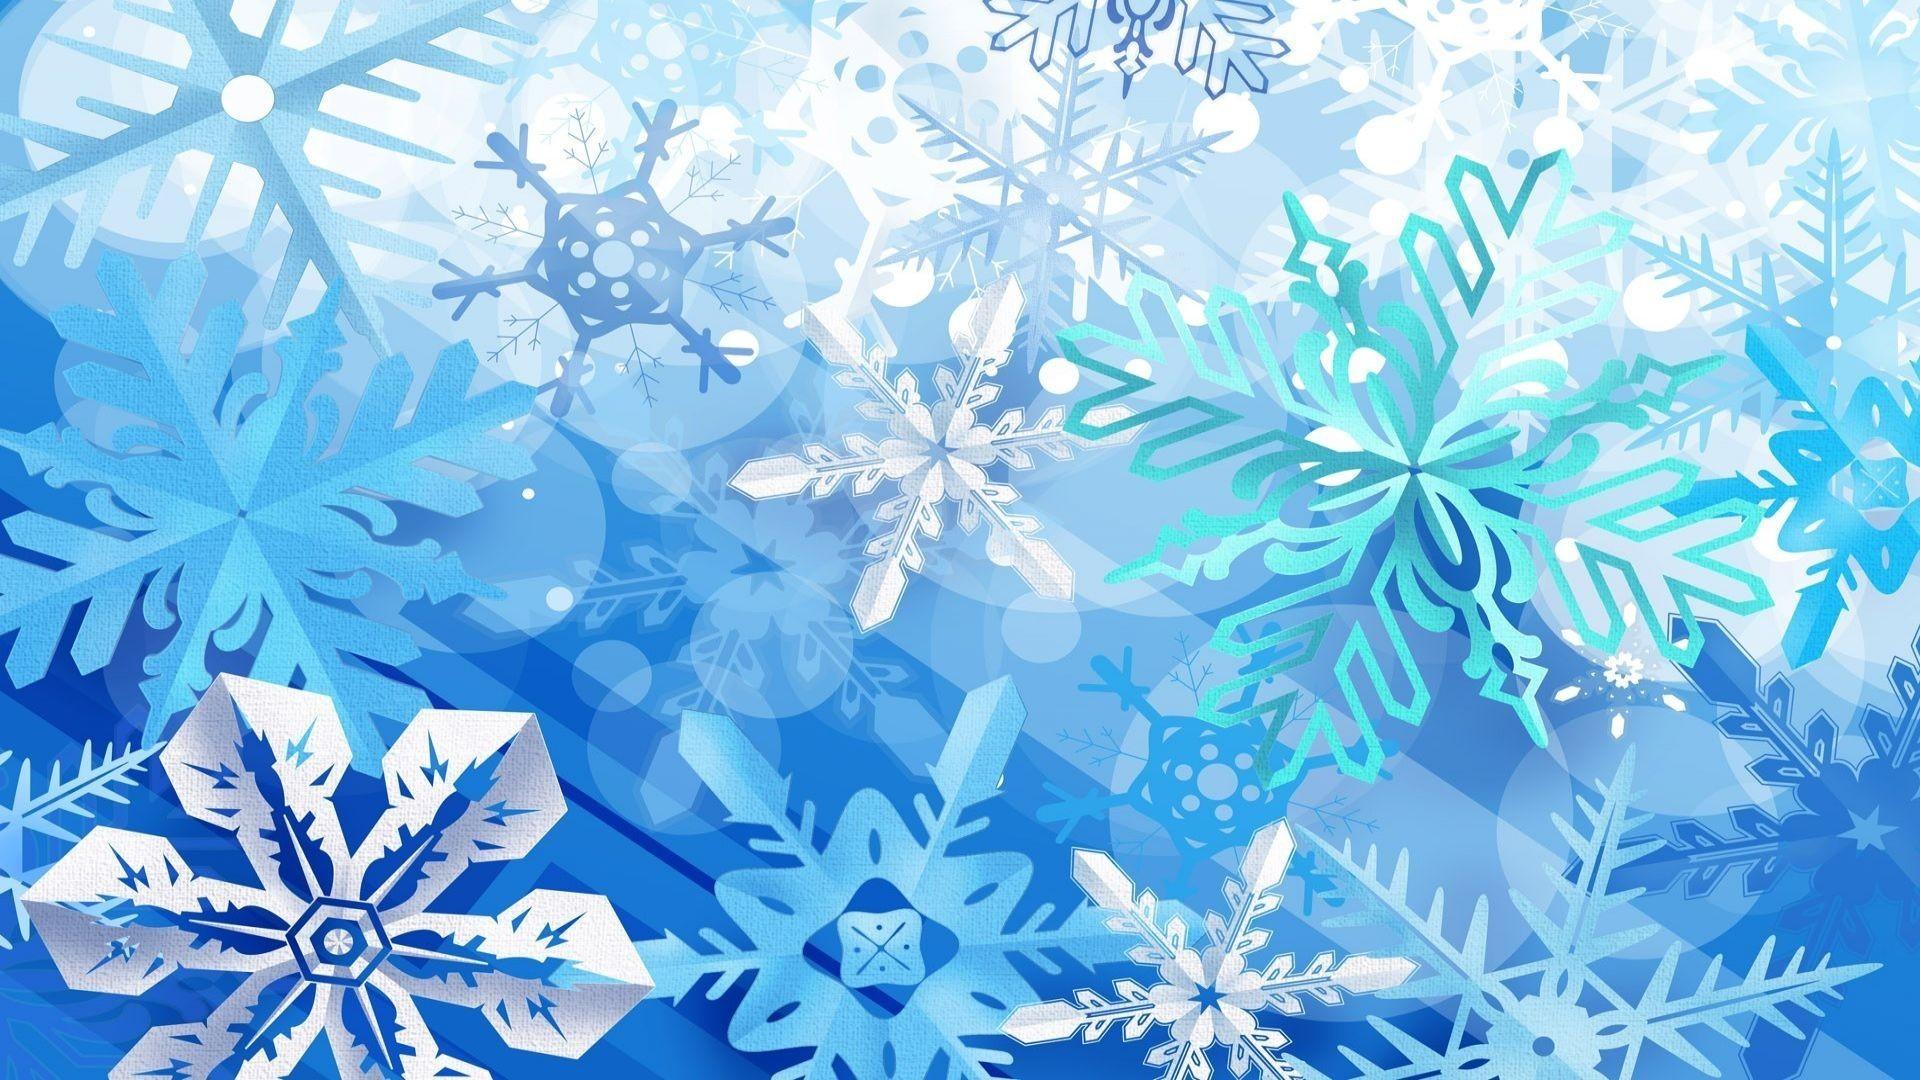 Snow Background 17154